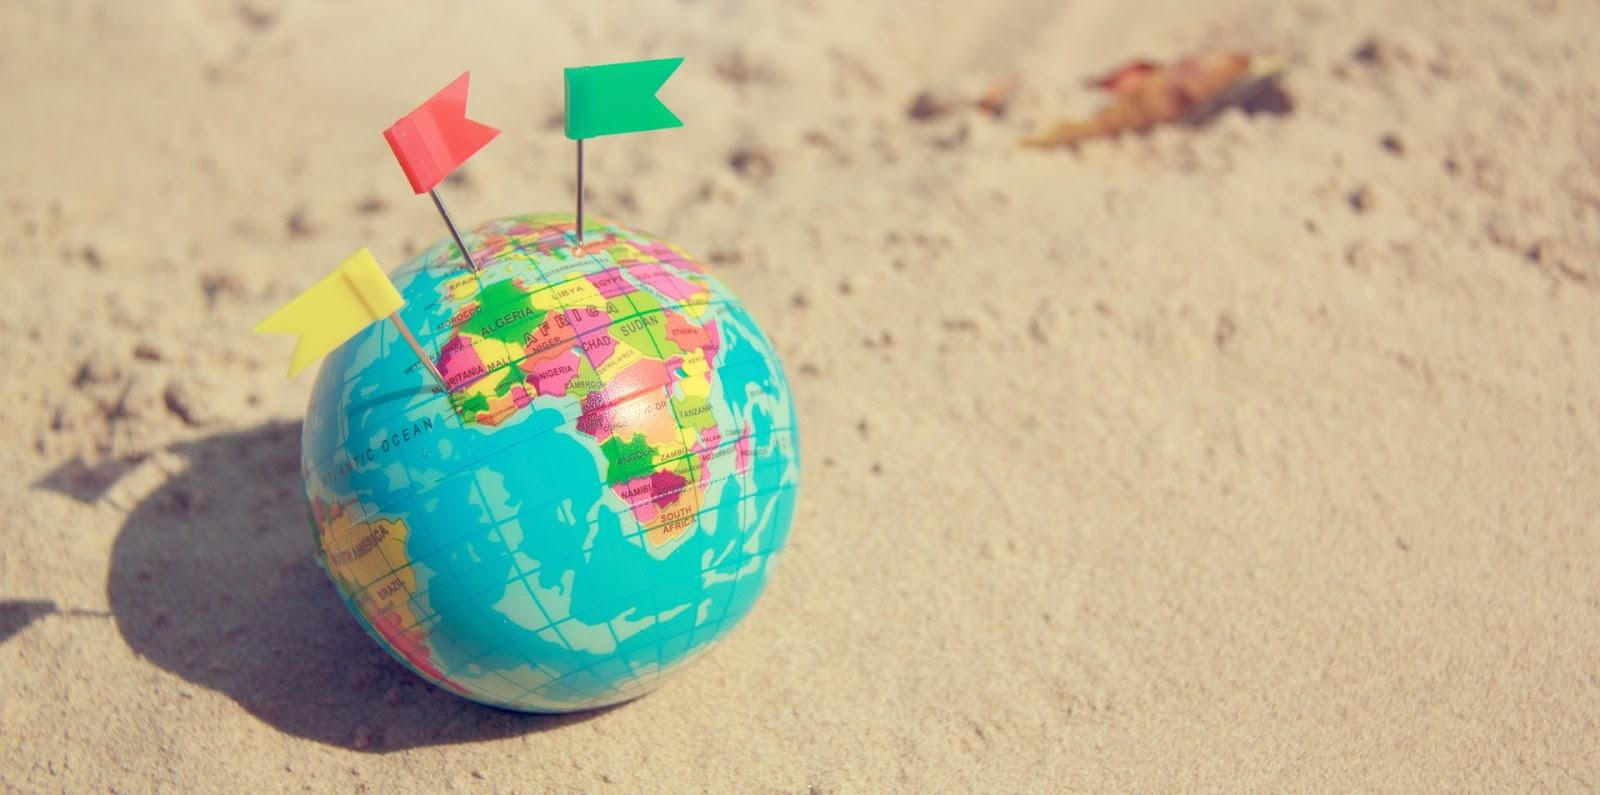 Tourismusmanagement - was danach?